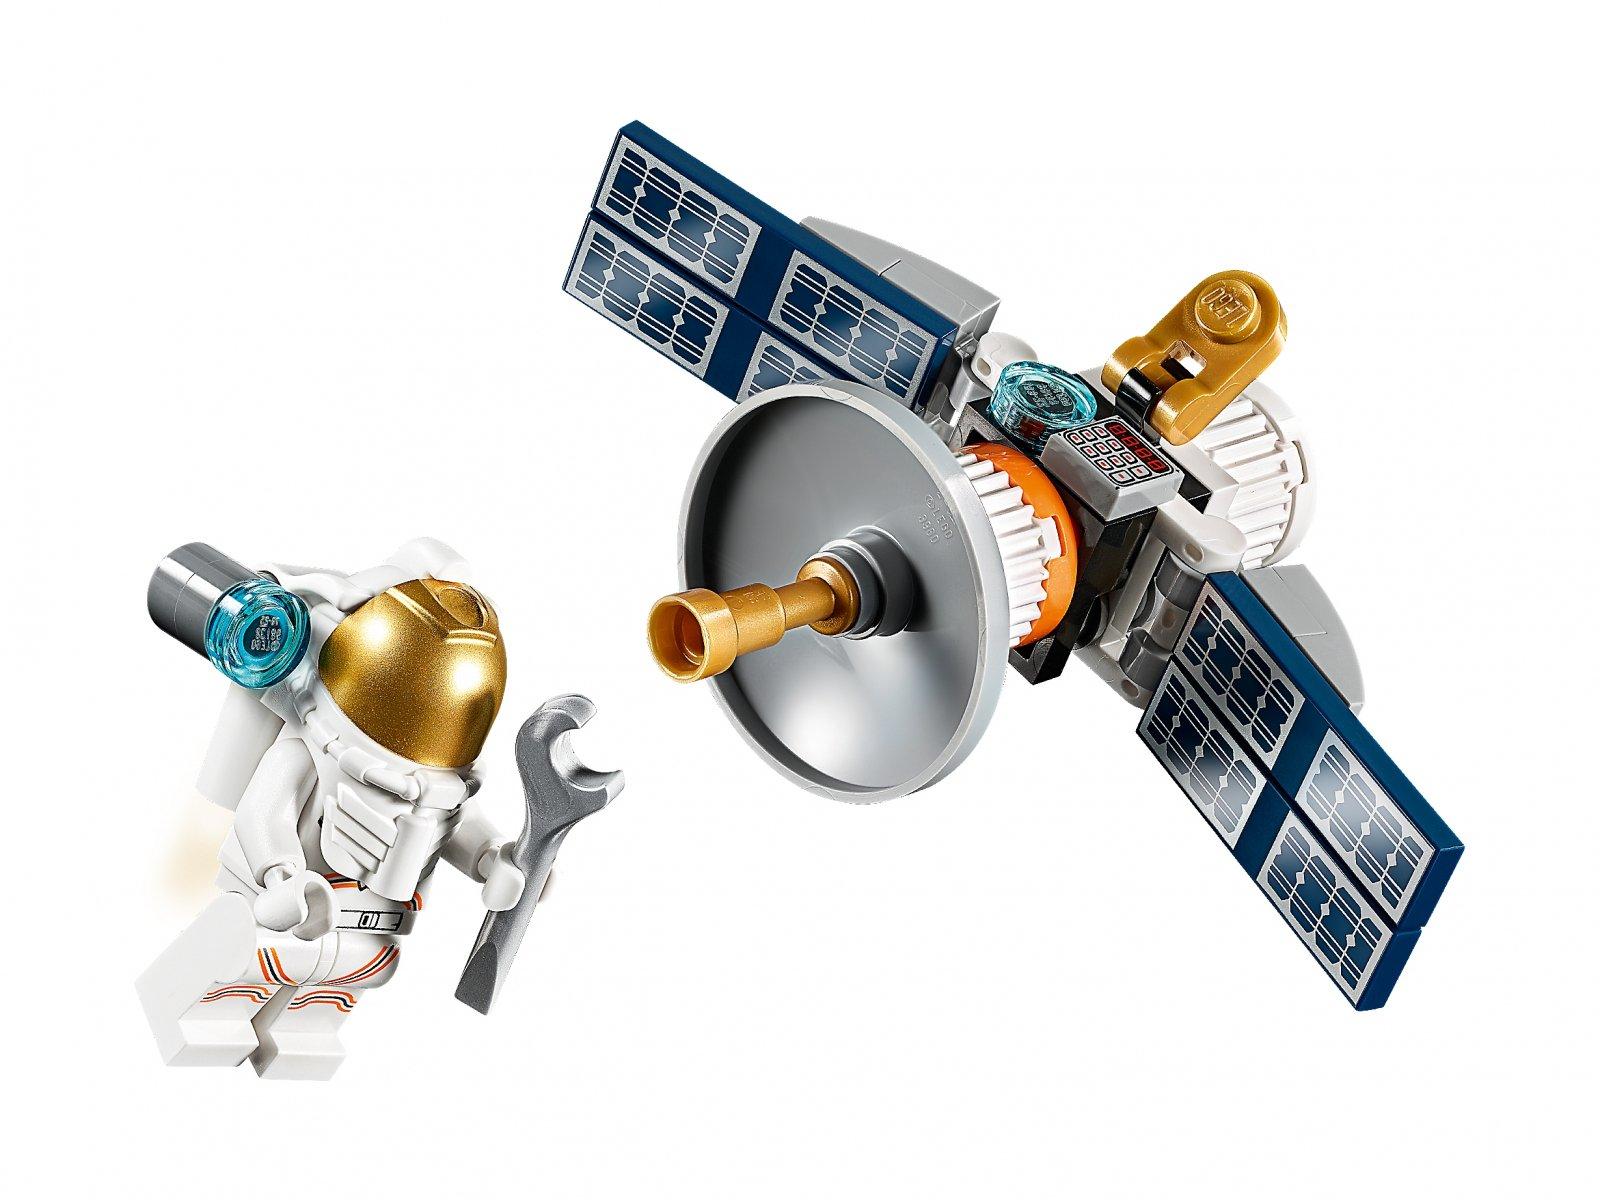 LEGO City 30365 Space Satellite